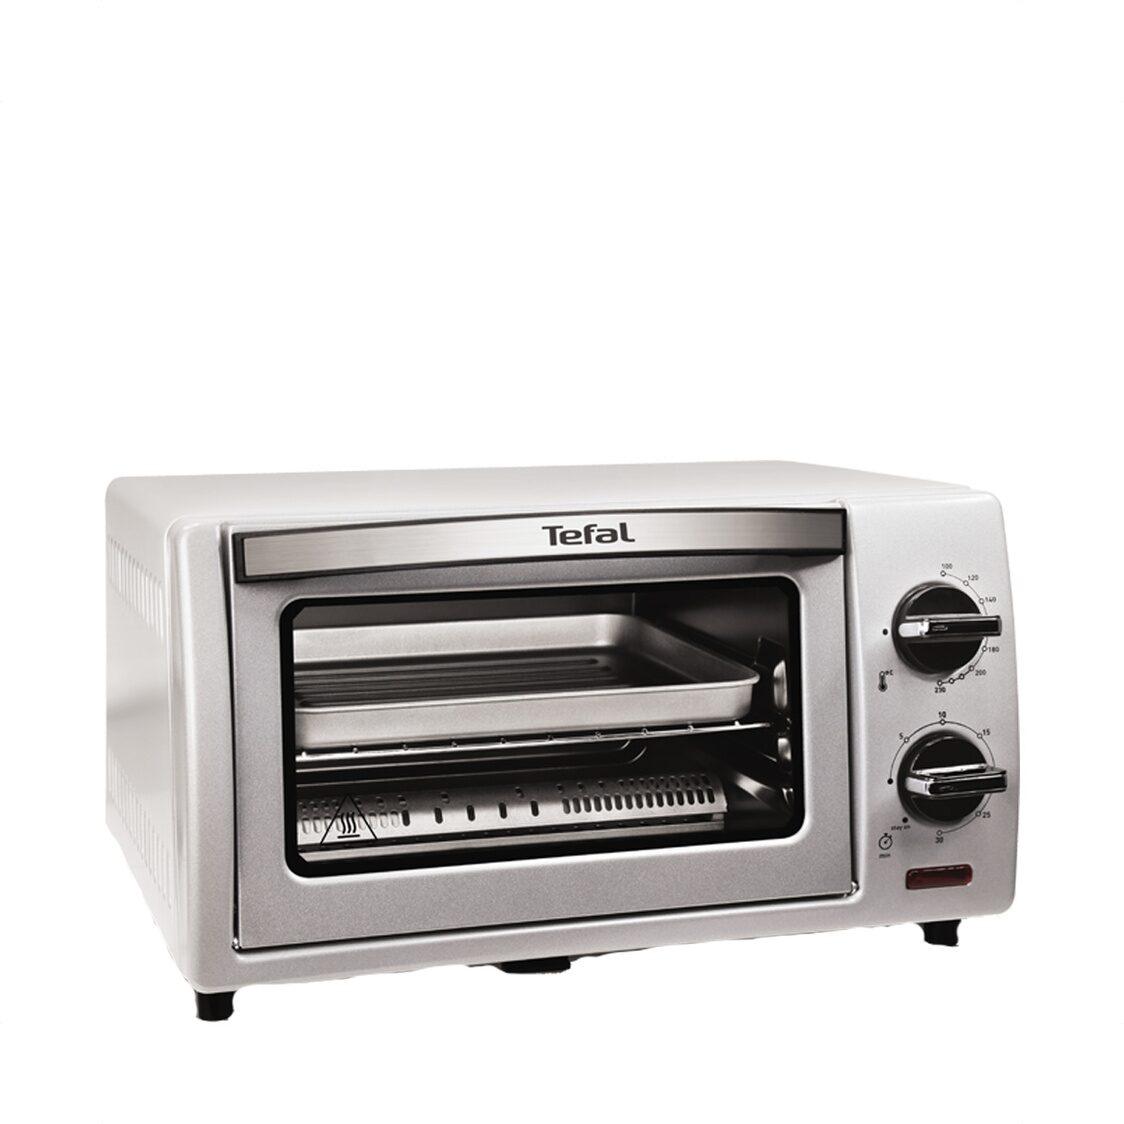 Tefal Equinox Toaster Oven 9L OF500E